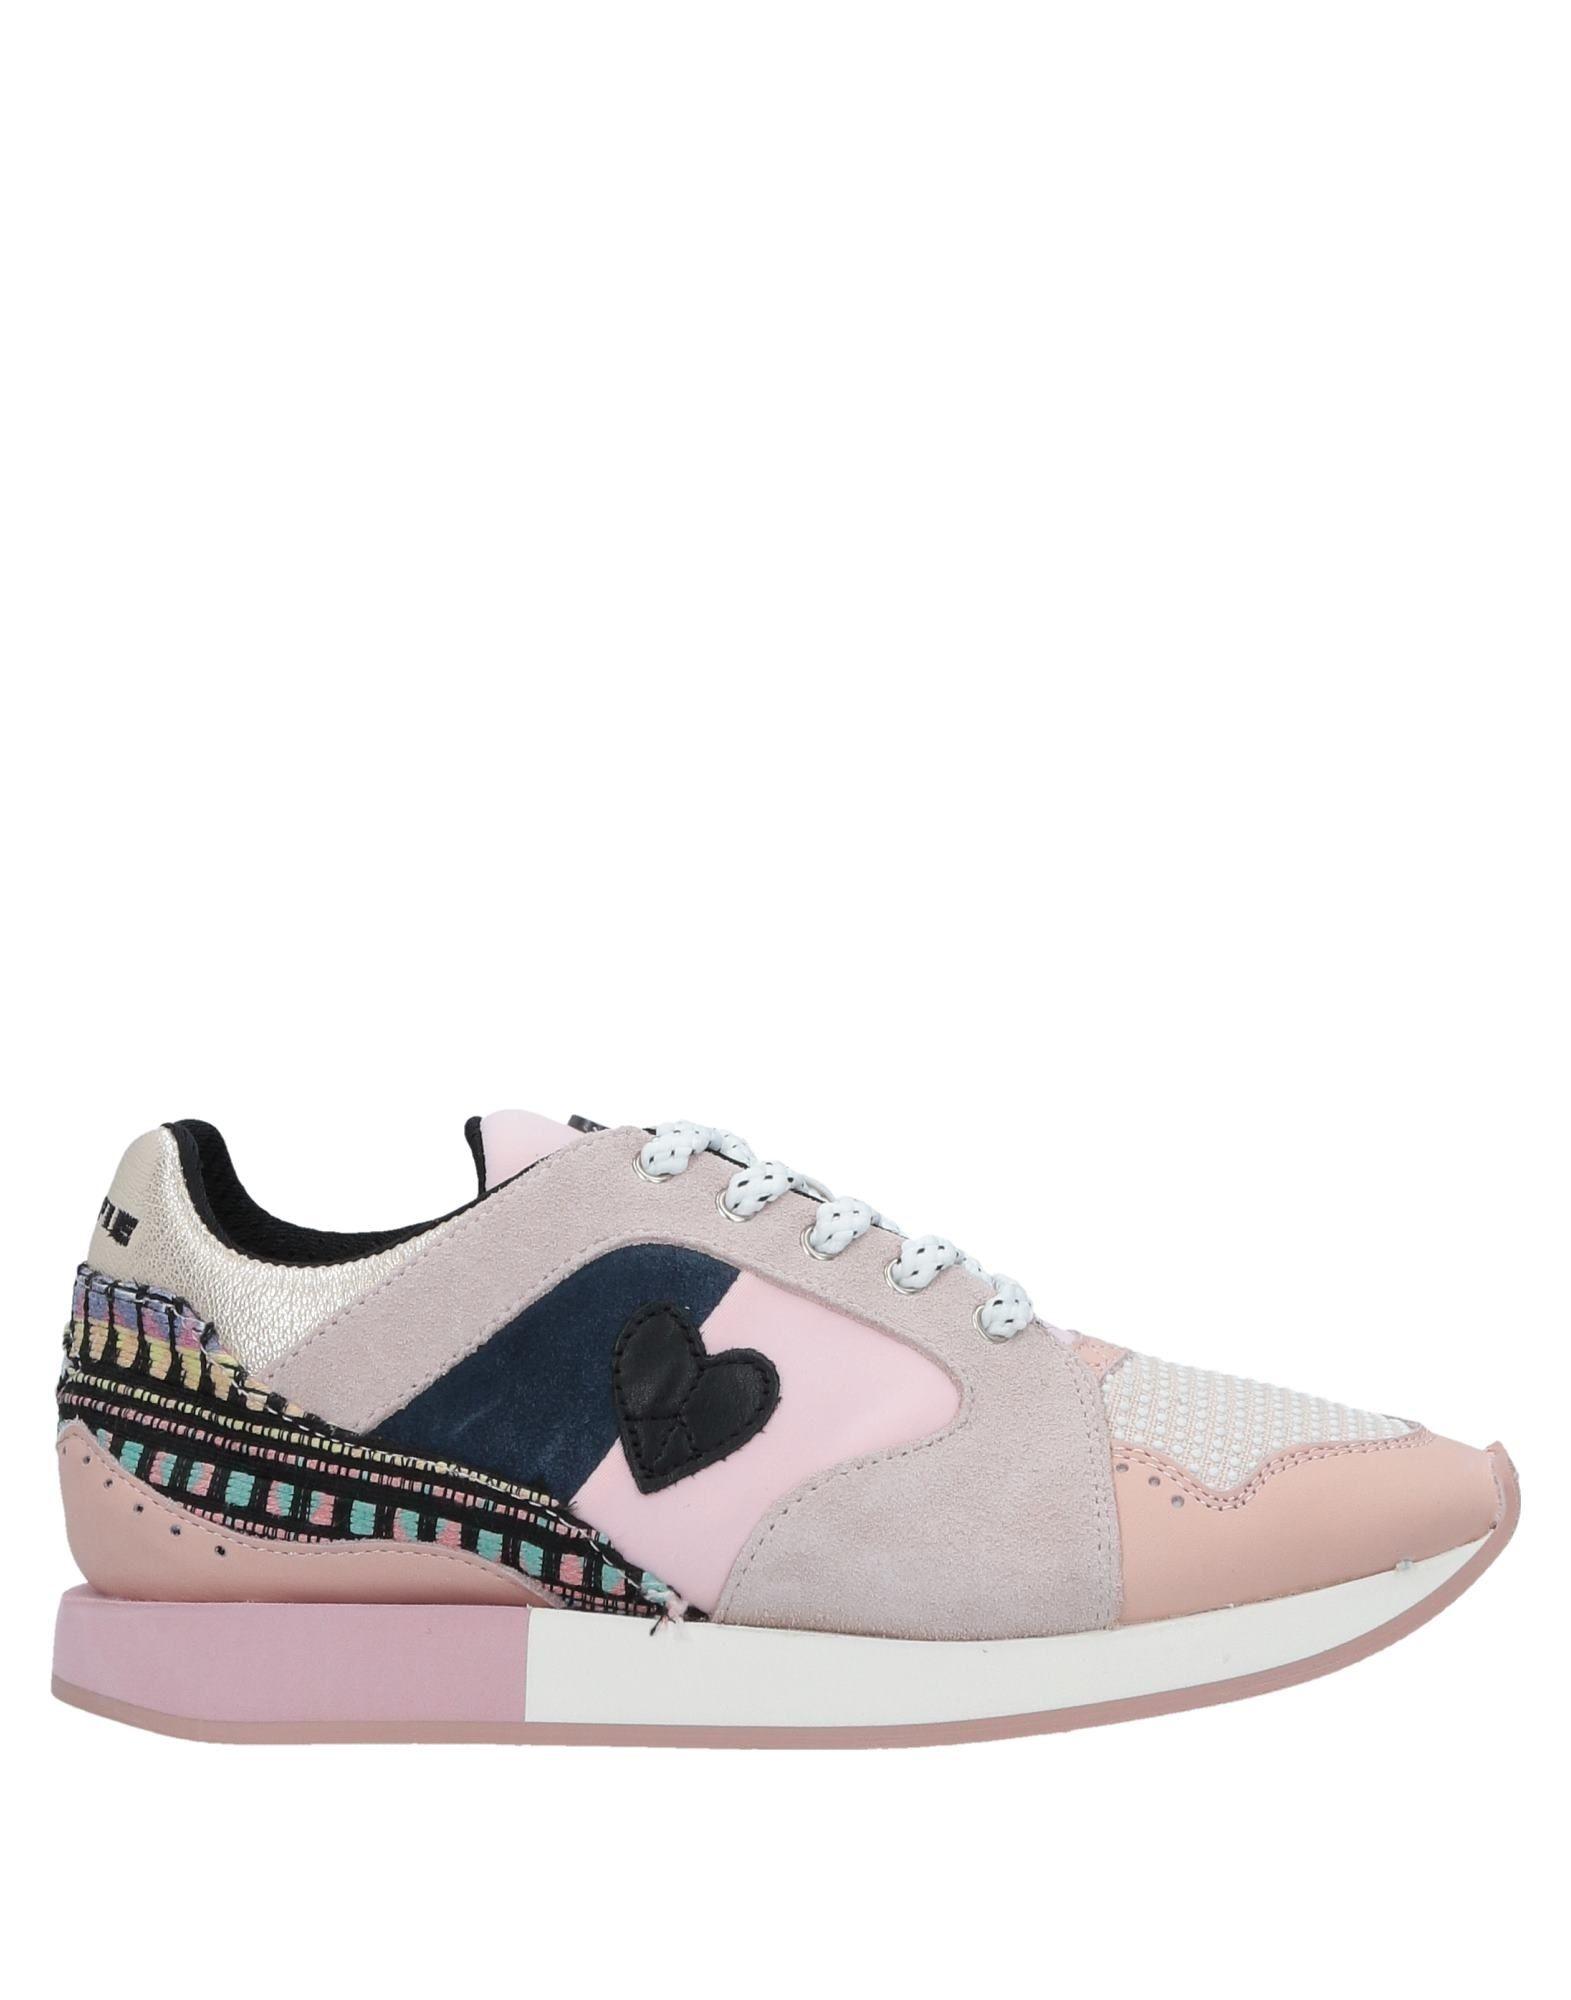 Dolfie Sneakers Damen  11529051JI Gute Qualität beliebte Schuhe